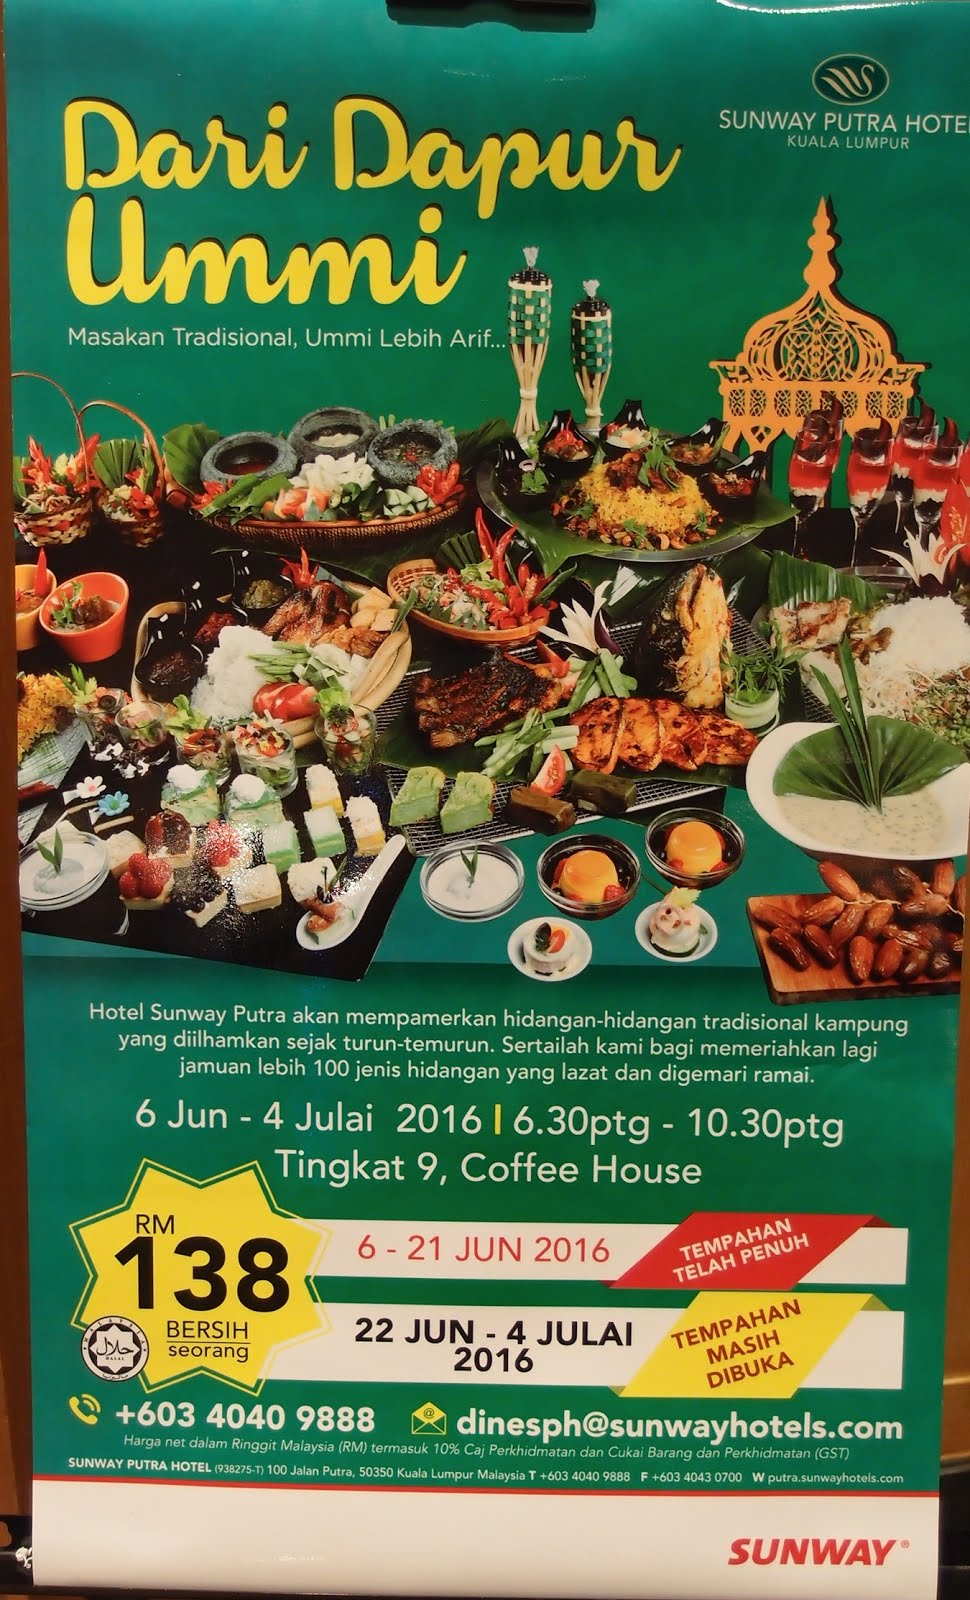 Best Restaurant To Eat Malaysian Food Travel Blog 2016 Ramadan Buffet Kuala Lumpur Sunway Putra Hotel Dari Dapur Ummi